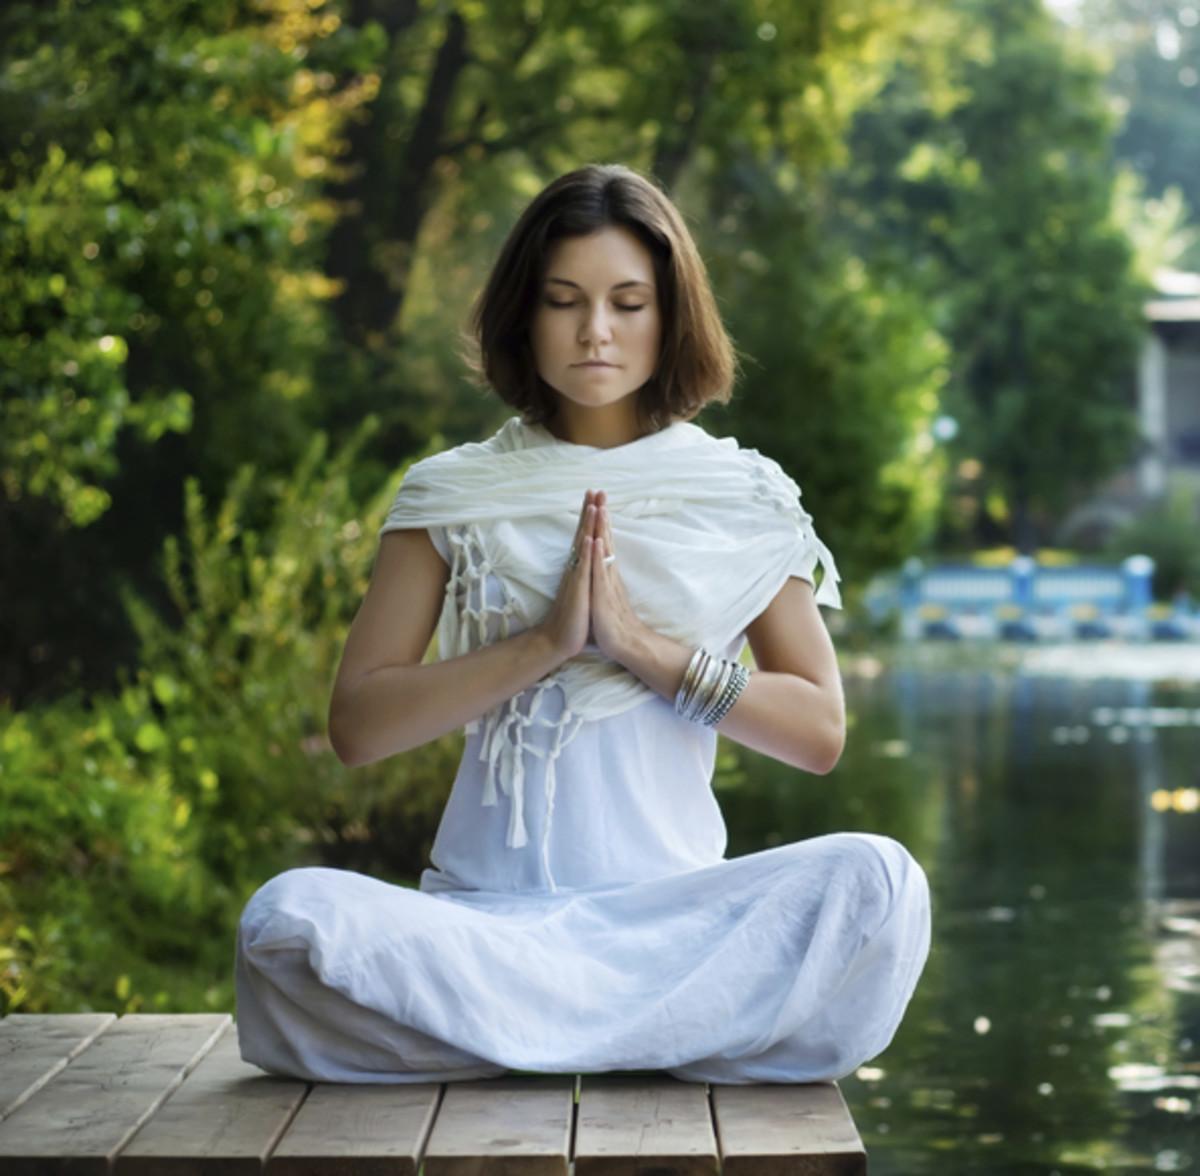 Master the zen-like art of not caring.